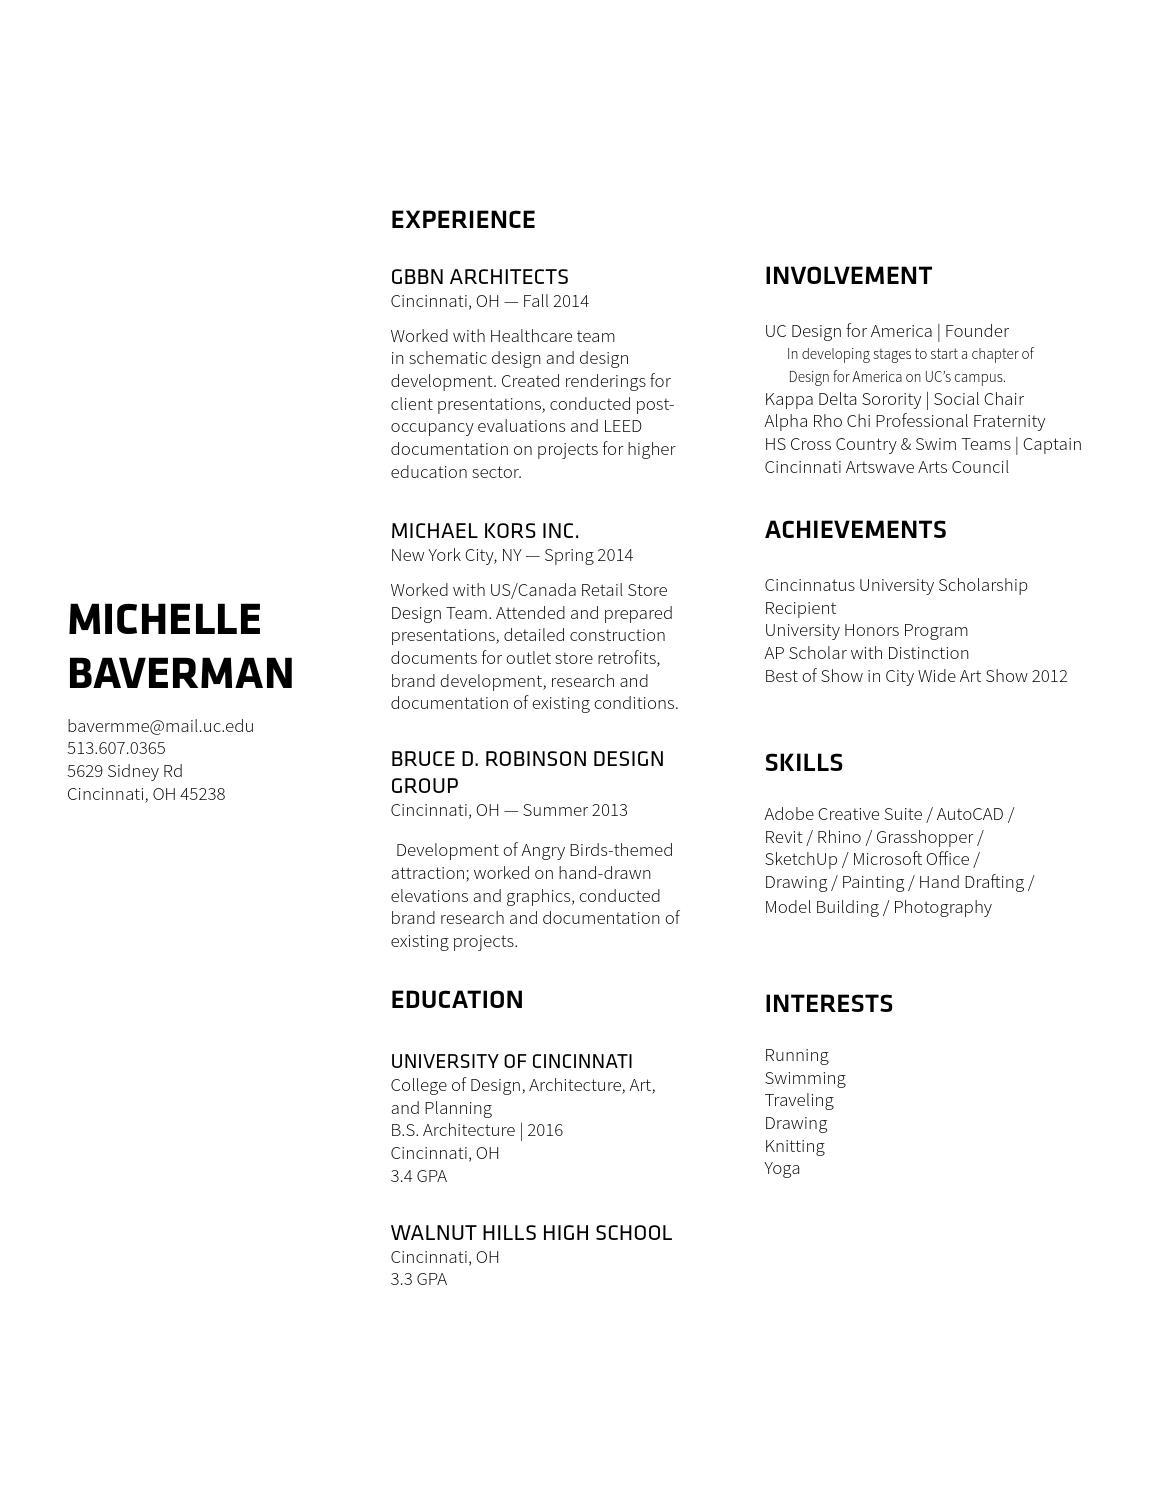 resume by michelle baverman